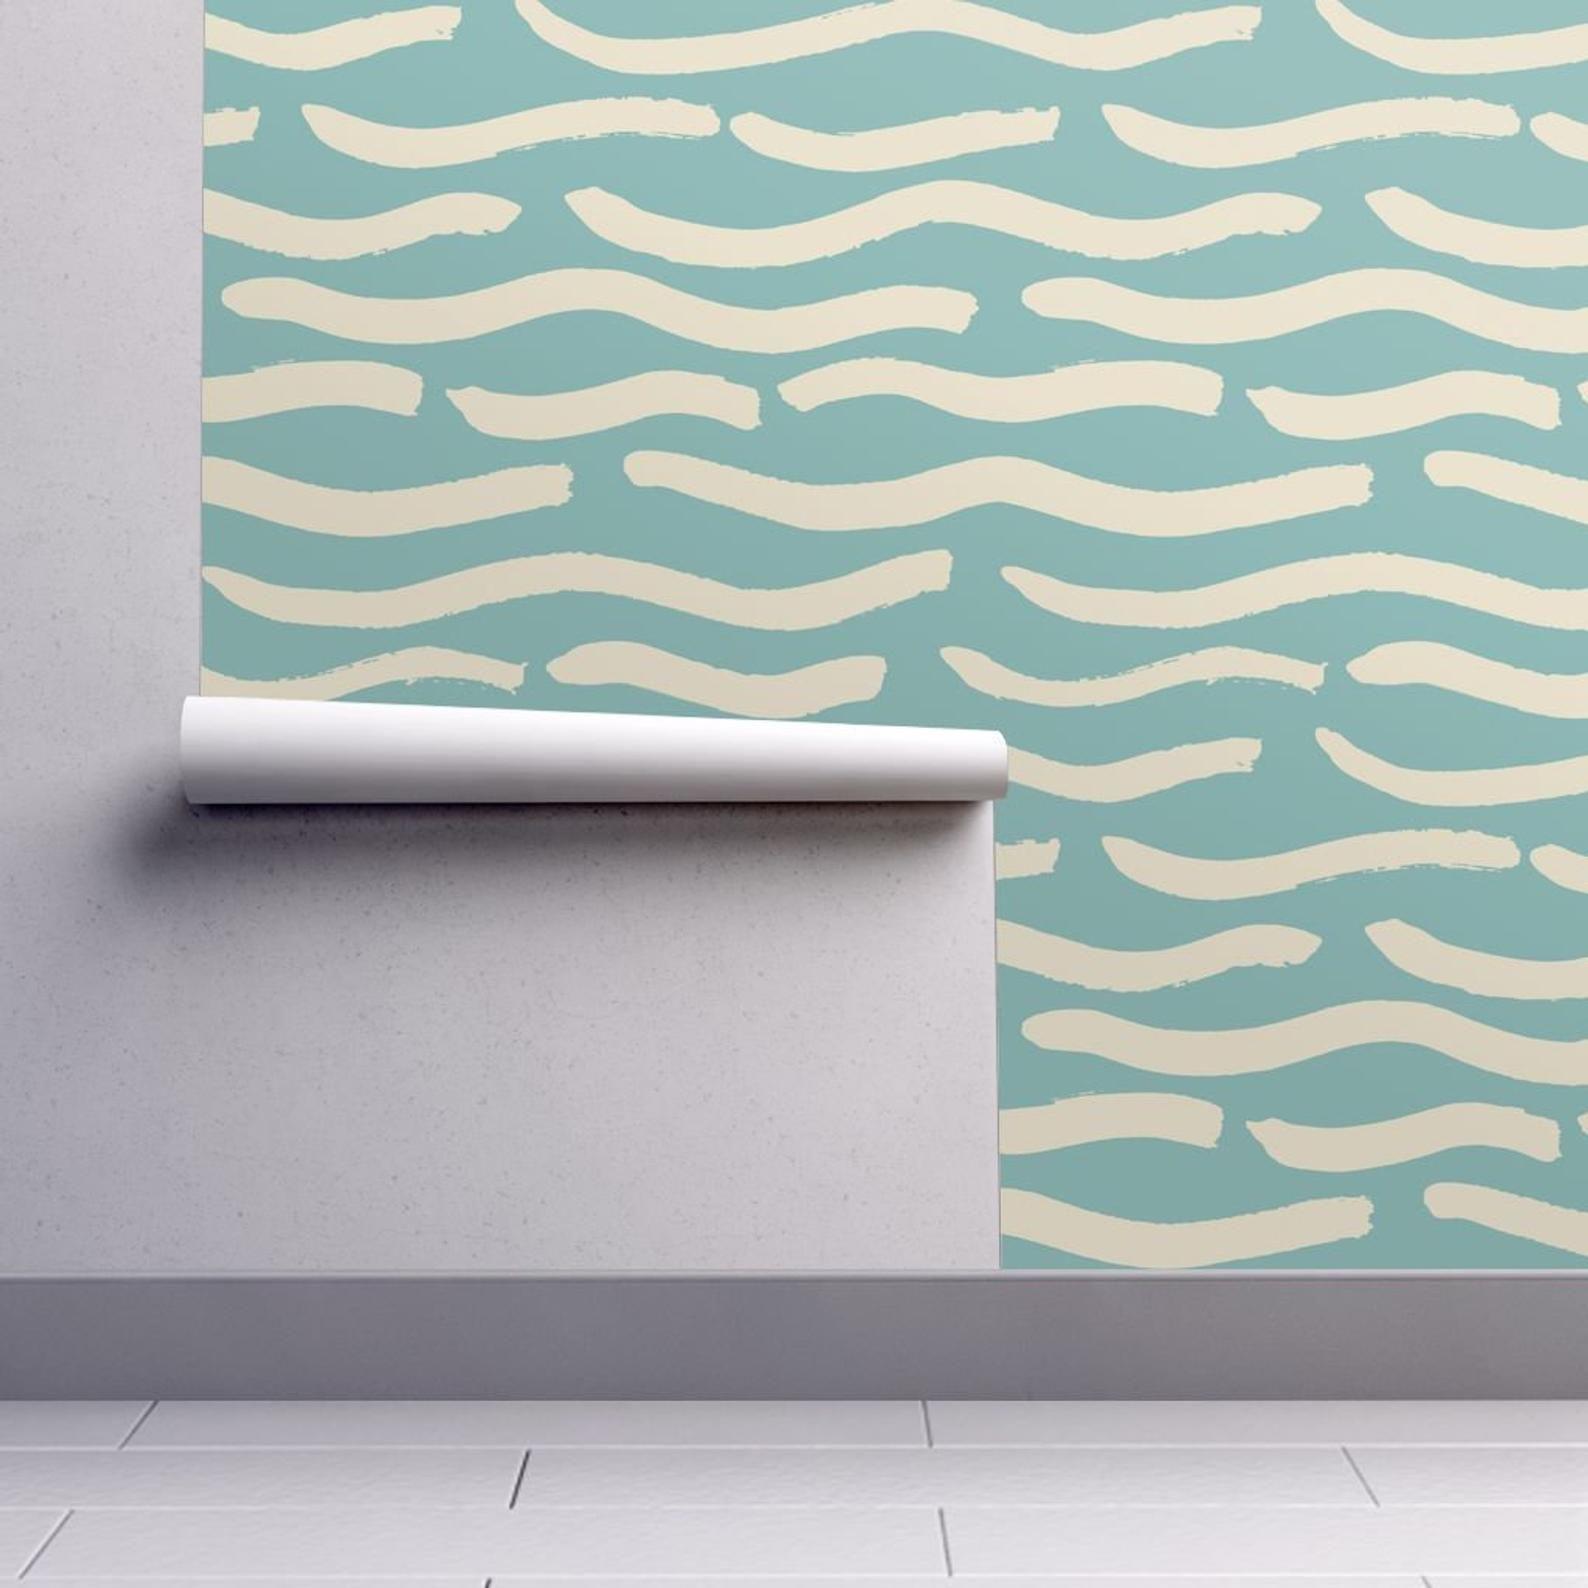 Aquamarine Wallpaper Waves On Aquamarine By Juliaschumacher Etsy Self Adhesive Wallpaper Wallpaper Spoonflower Wallpaper